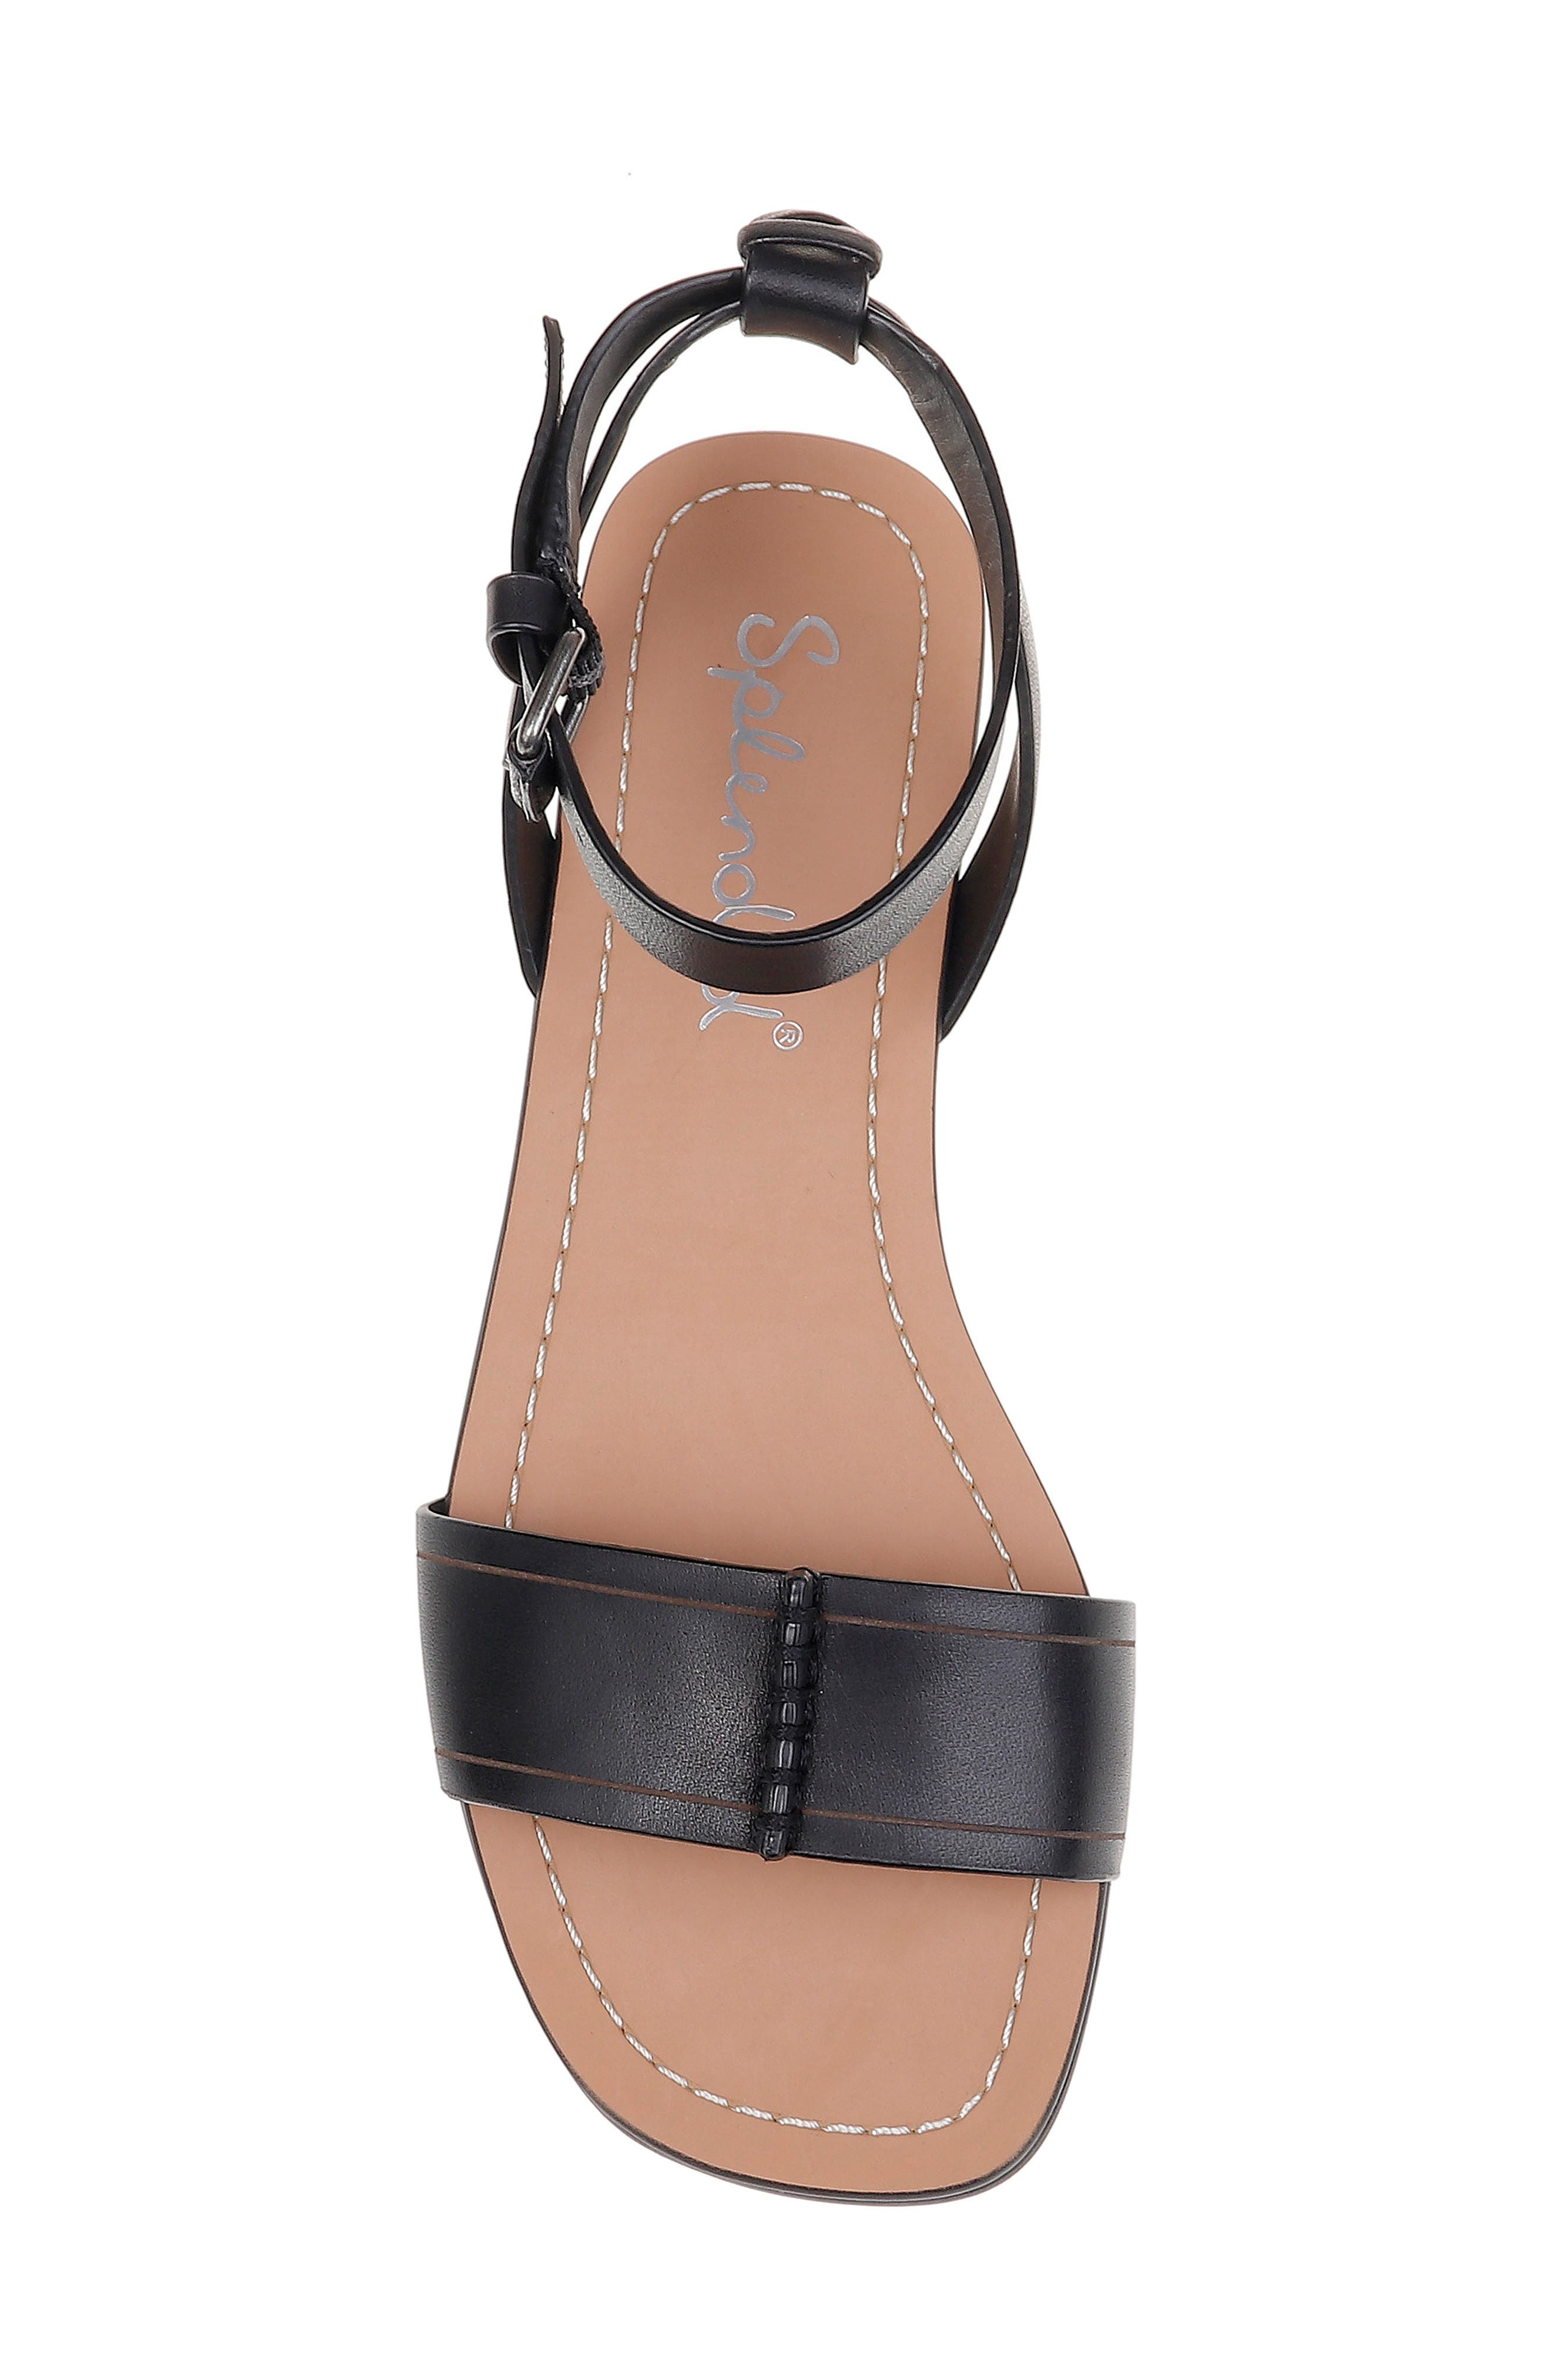 SPLENDID, Tabitha Ankle Strap Flat Sandal, Alternate thumbnail 5, color, BLACK LEATHER